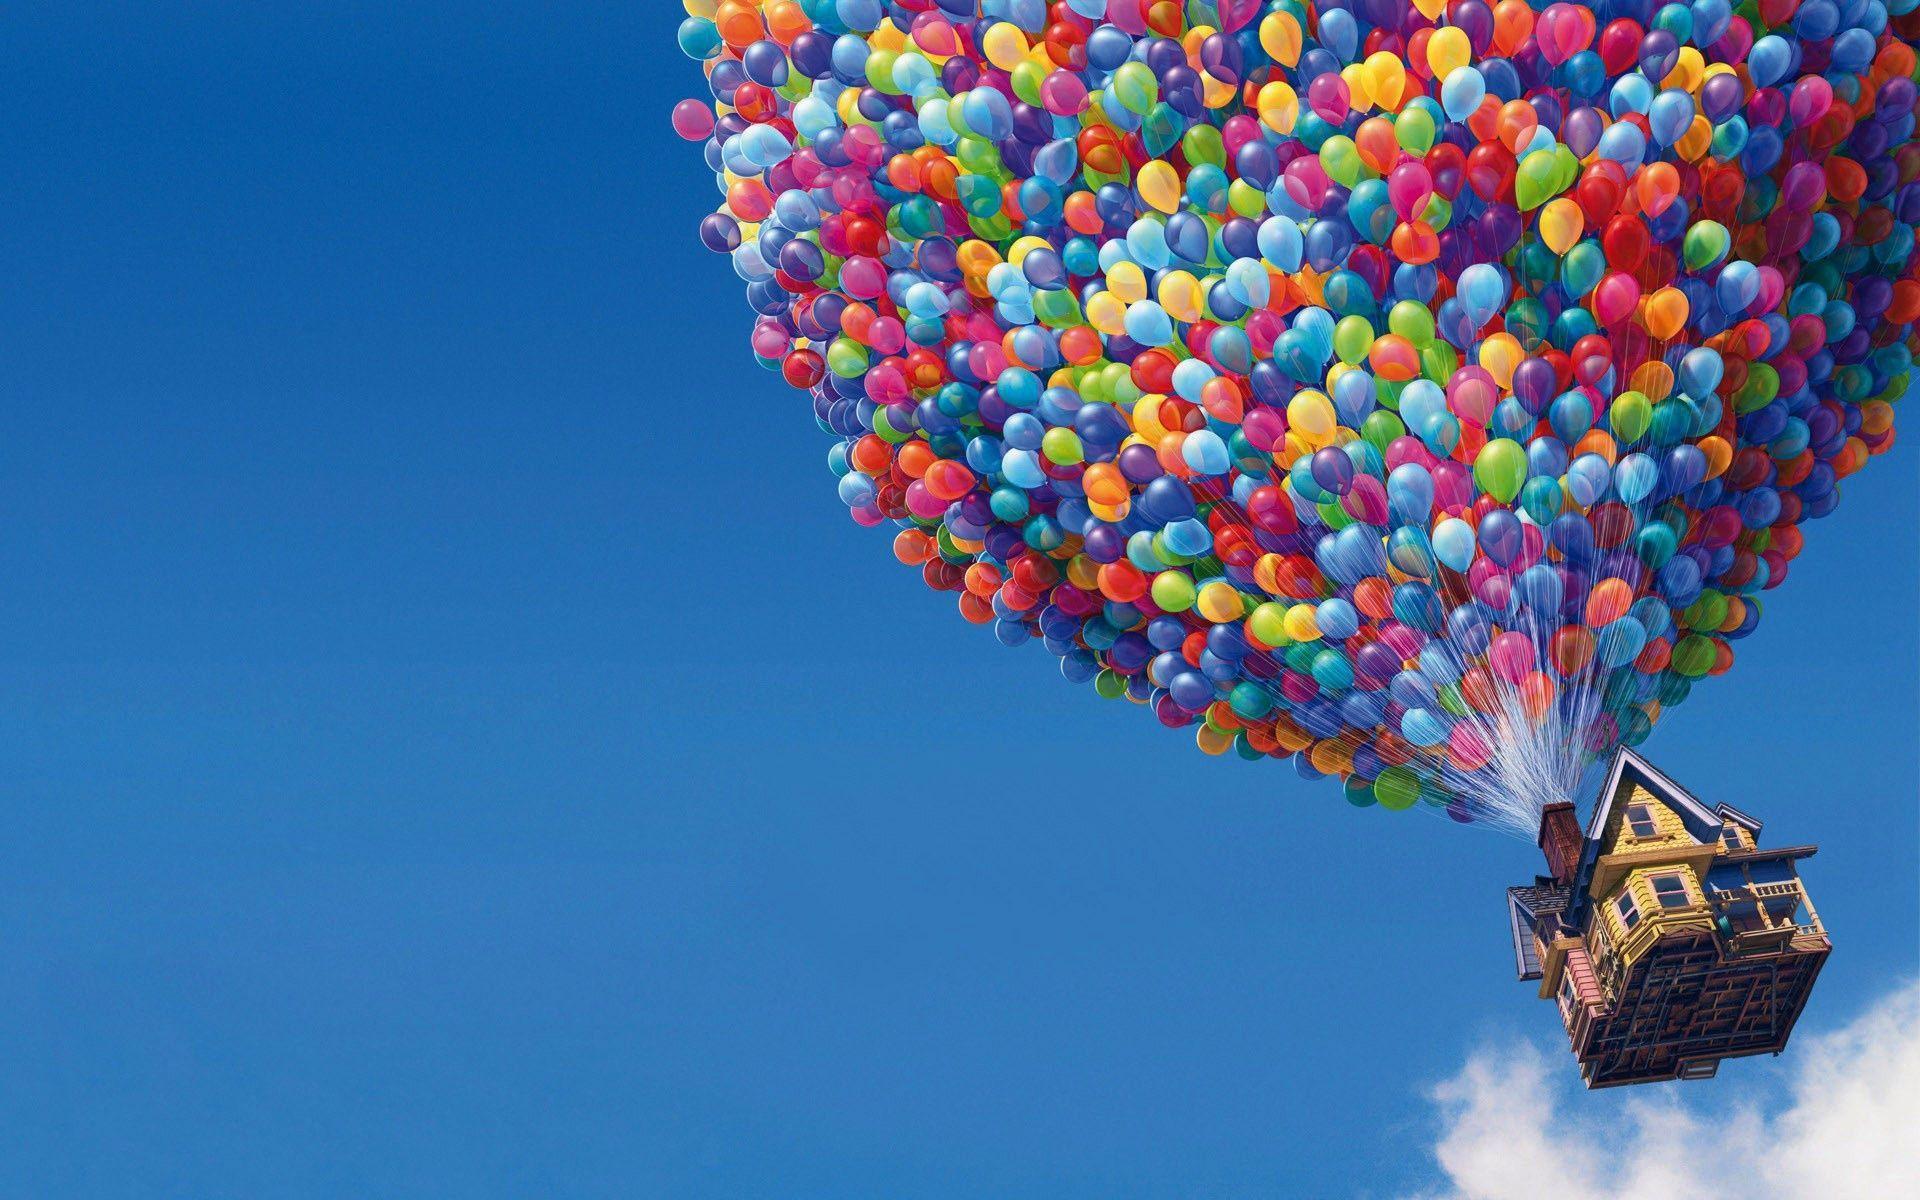 Balloon Wallpapers Top Free Balloon Backgrounds Wallpaperaccess